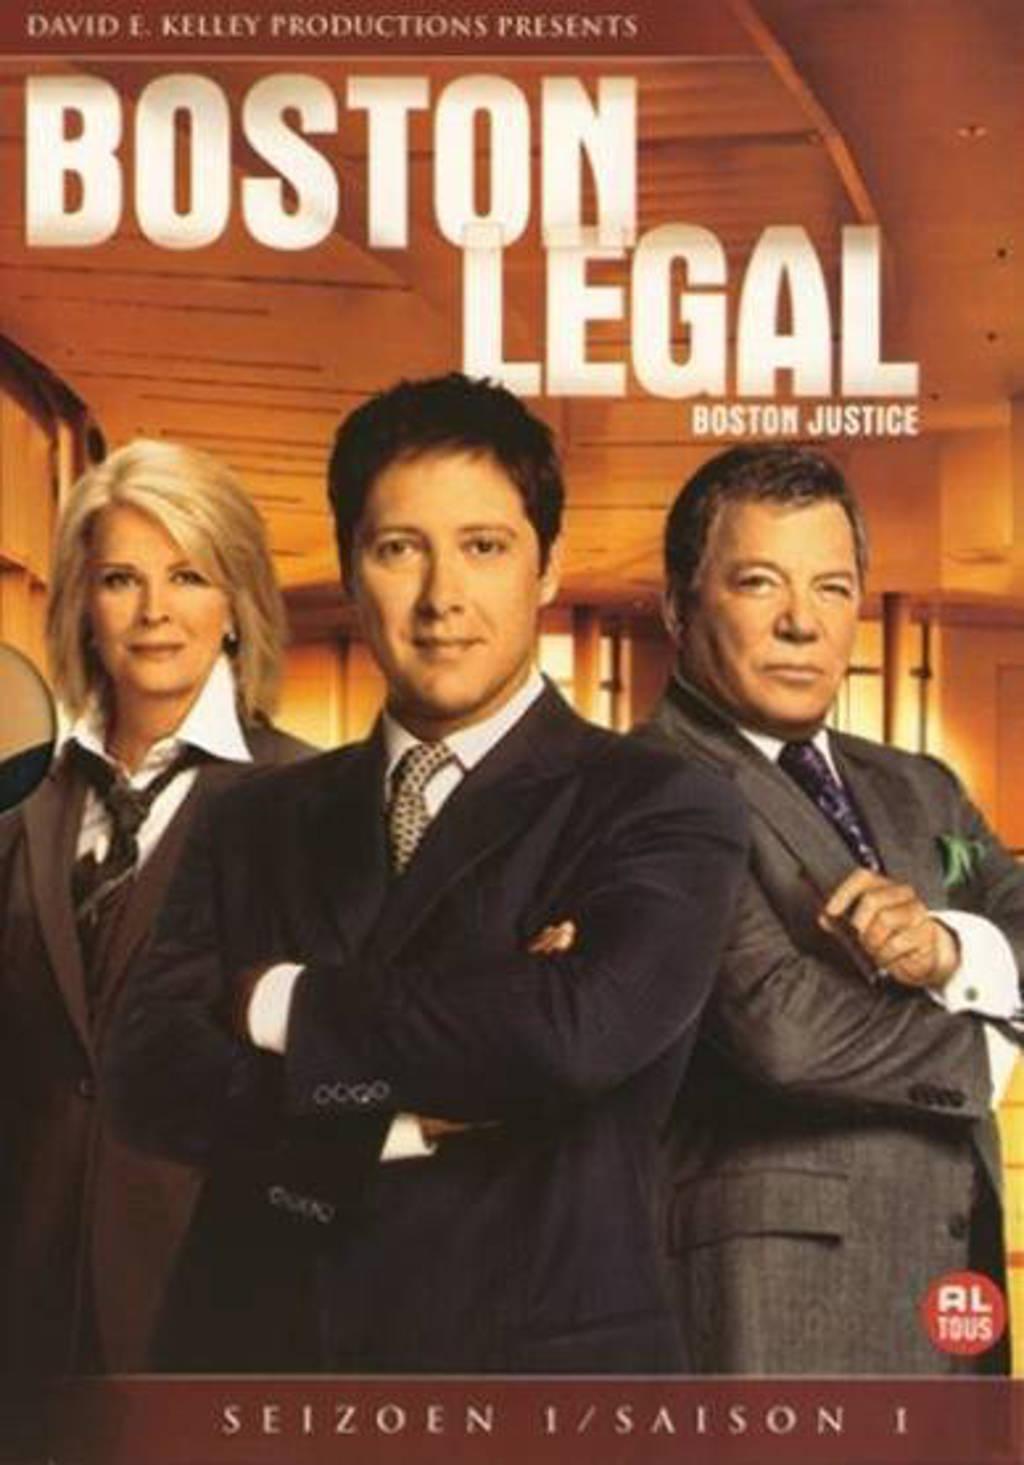 Boston legal - Seizoen 1 (DVD)